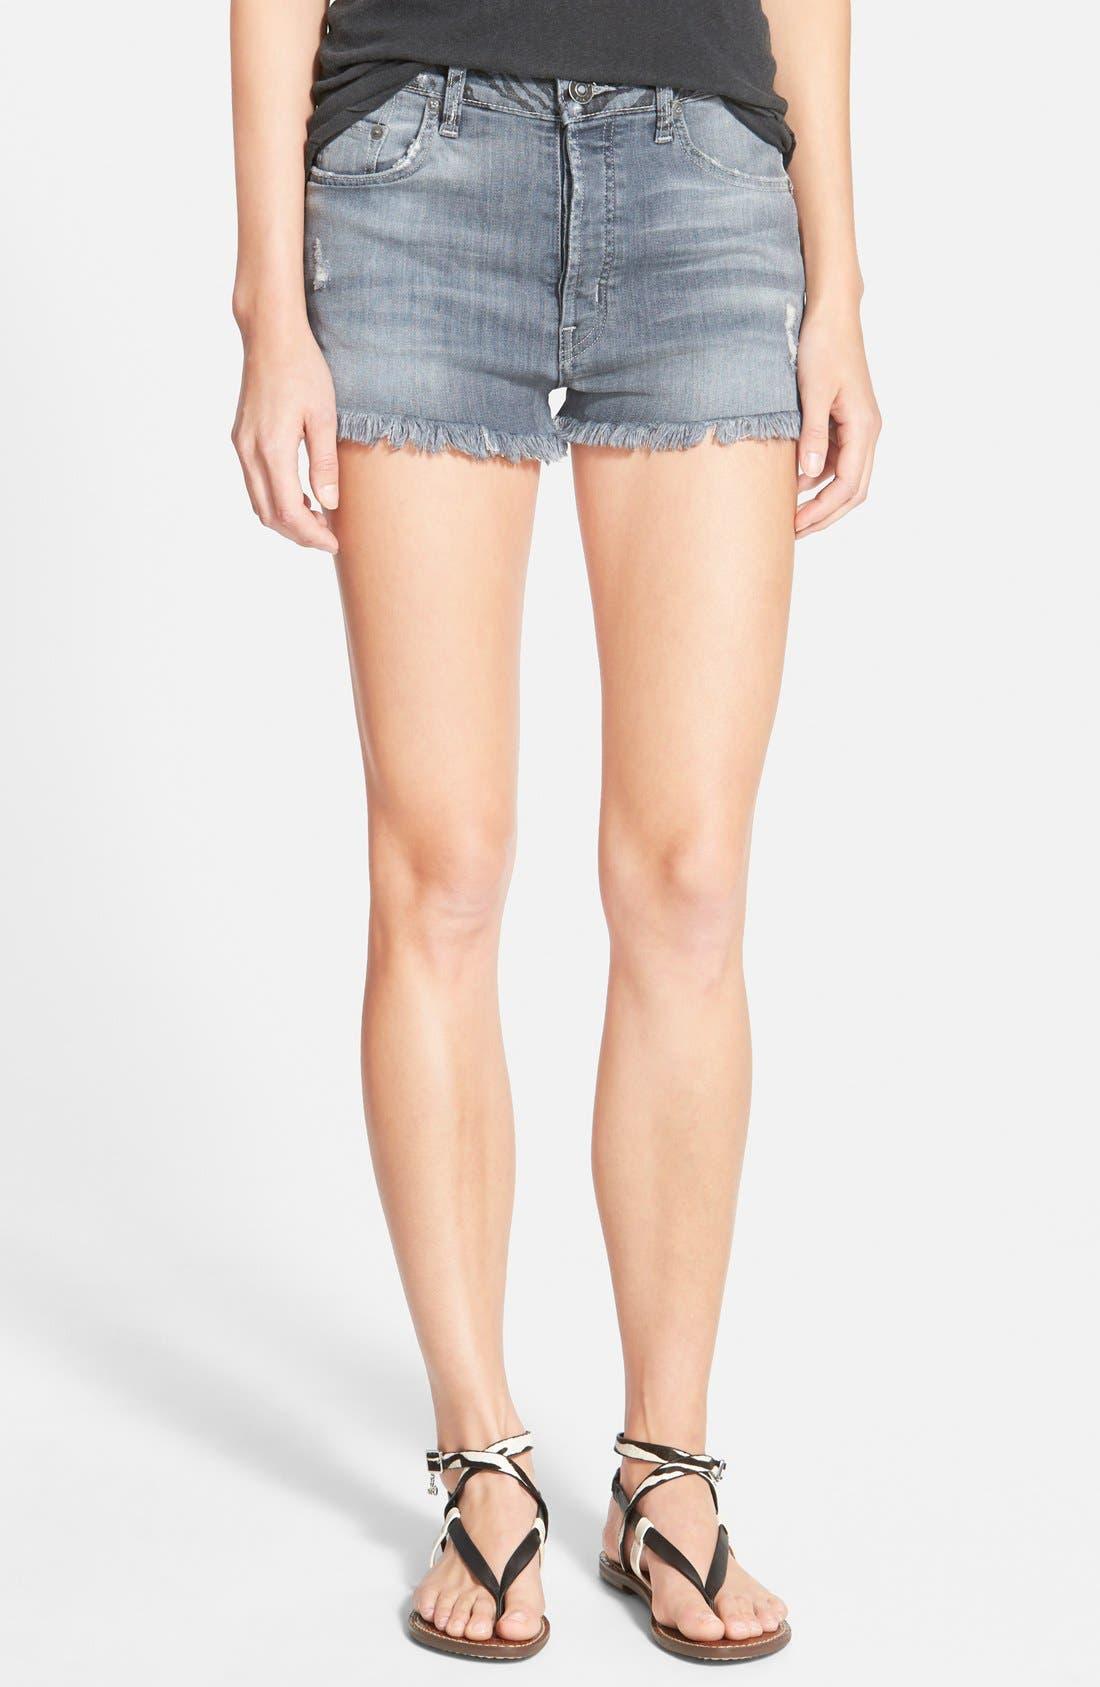 Alternate Image 1 Selected - Hudson Jeans 'Tori Vice Versa' Cutoff Denim Shorts (Twin Coast)